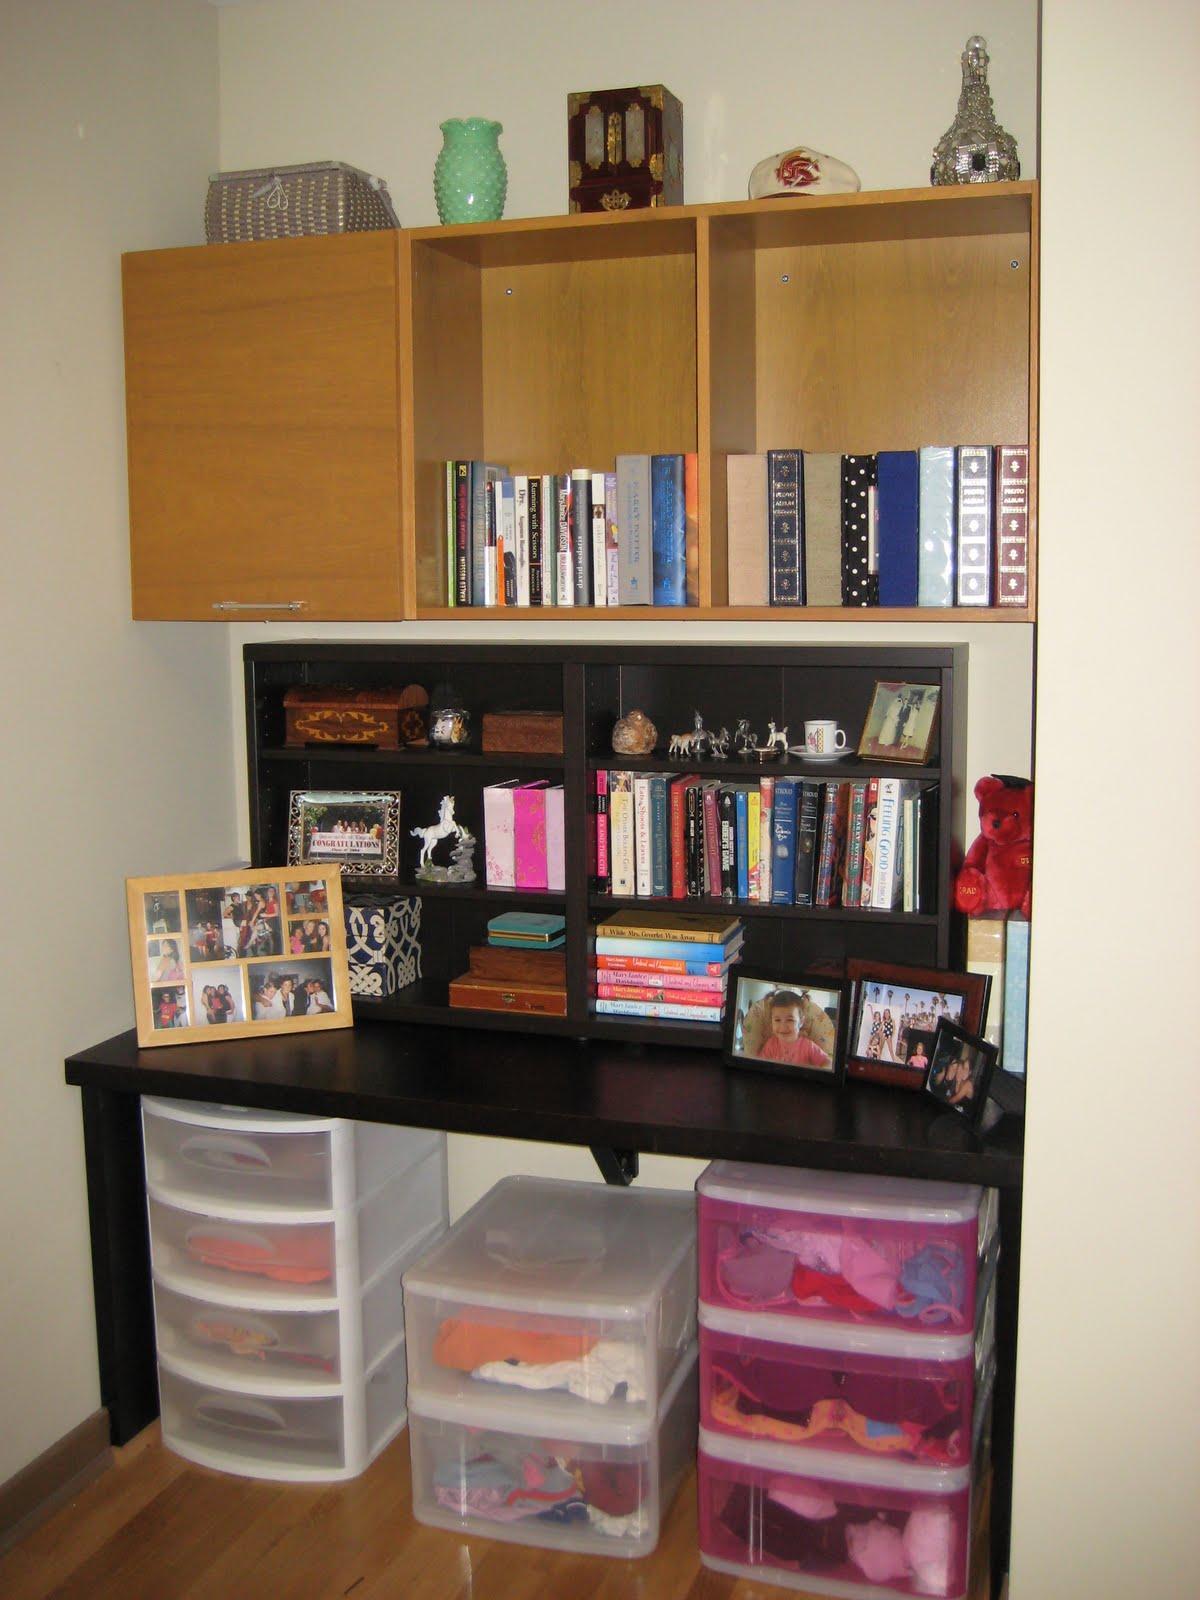 My Bedroom Shelfy Area, Post Zenning :